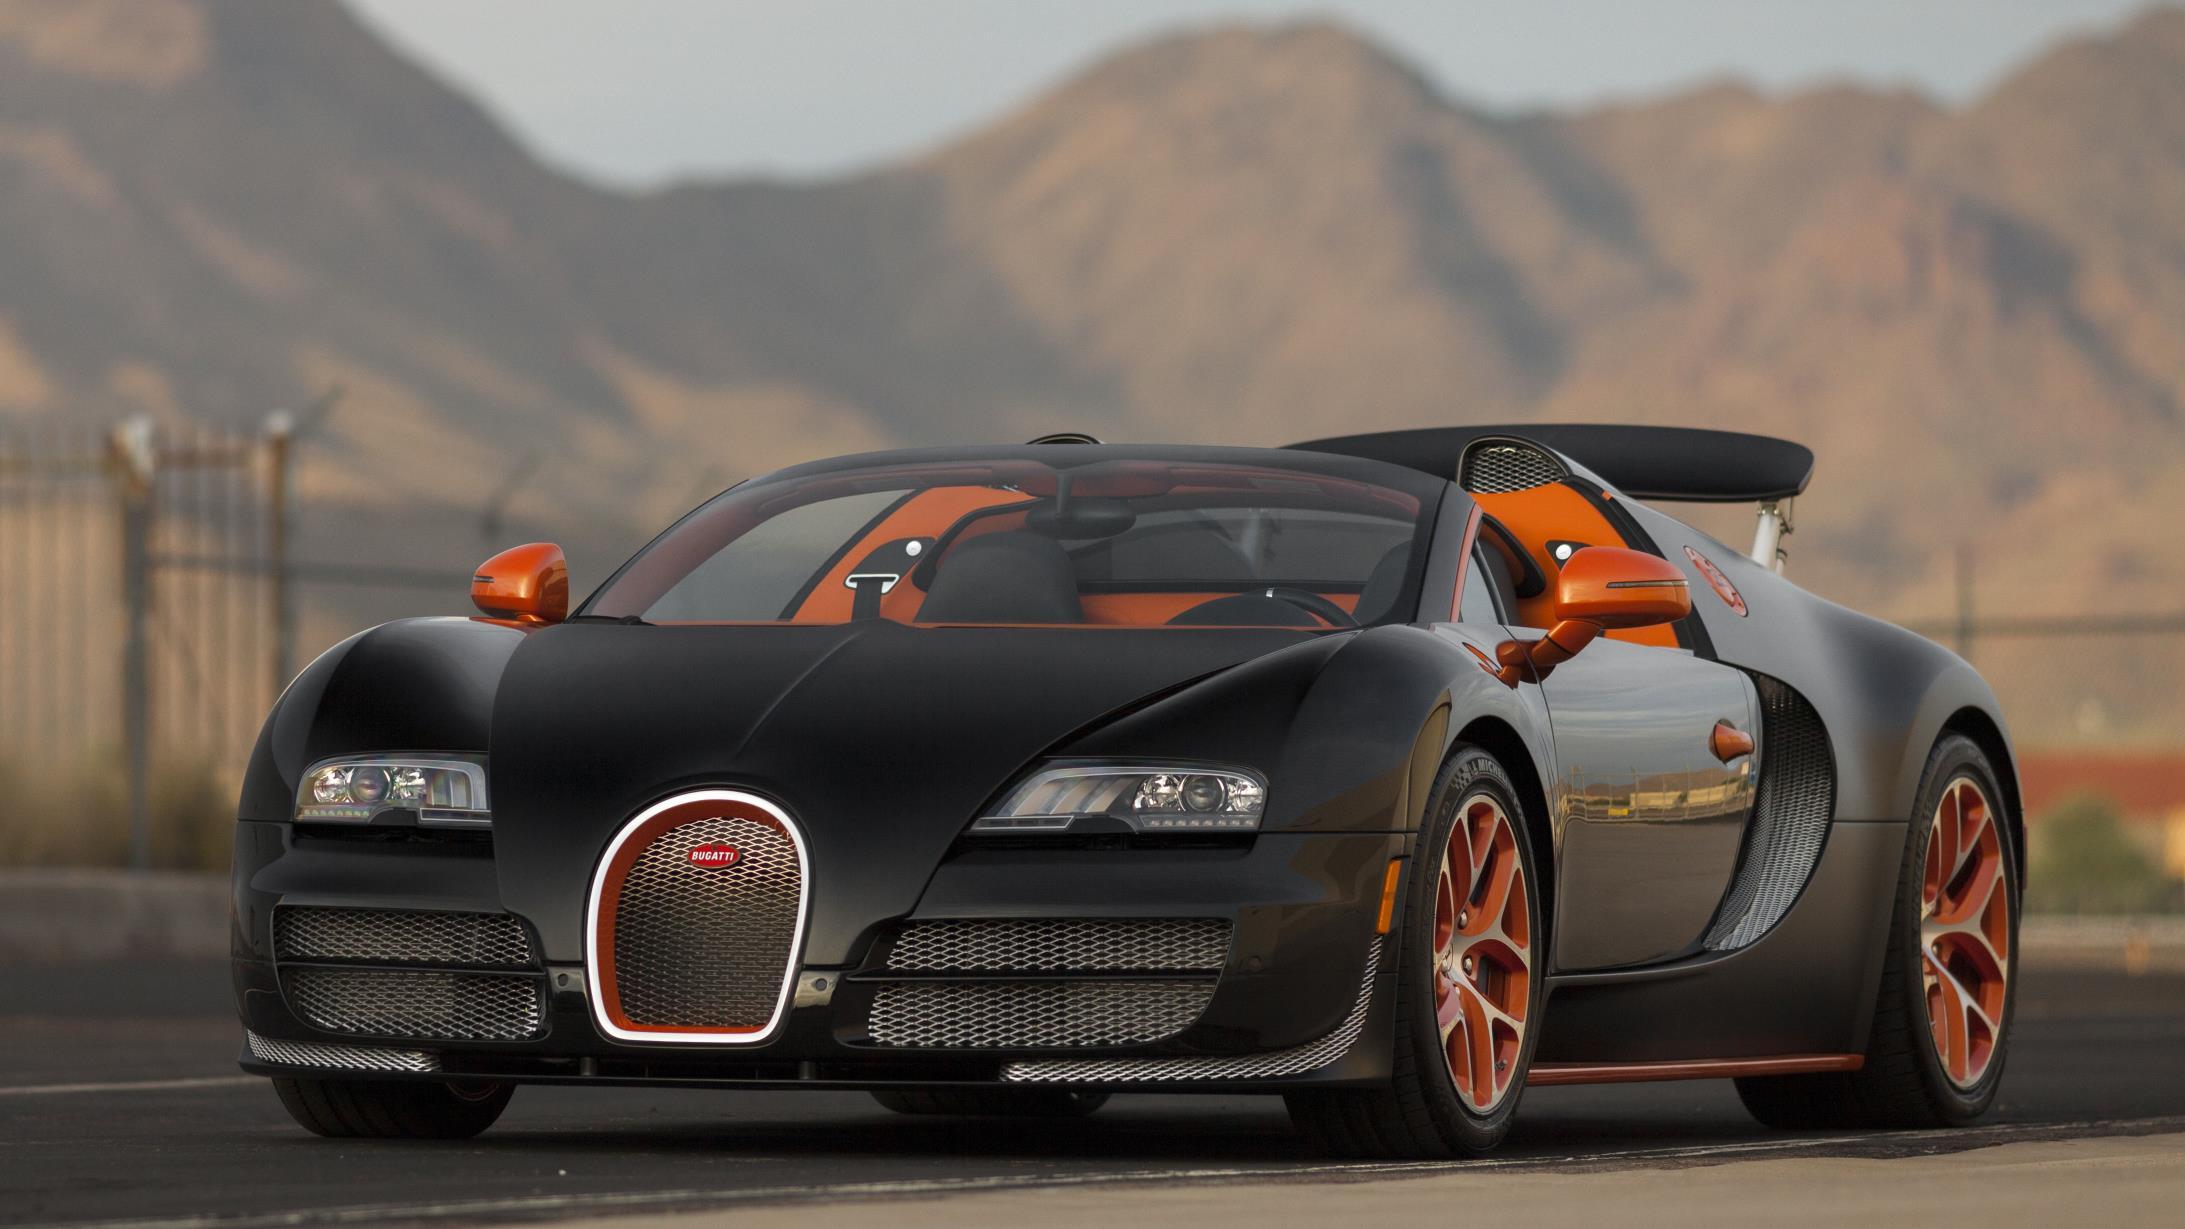 floyd-mayweather-s-koenigsegg-ccxr-trevita-is-up-for-grabs_4 Amazing Bugatti Veyron Grand Sport Vitesse Information Cars Trend